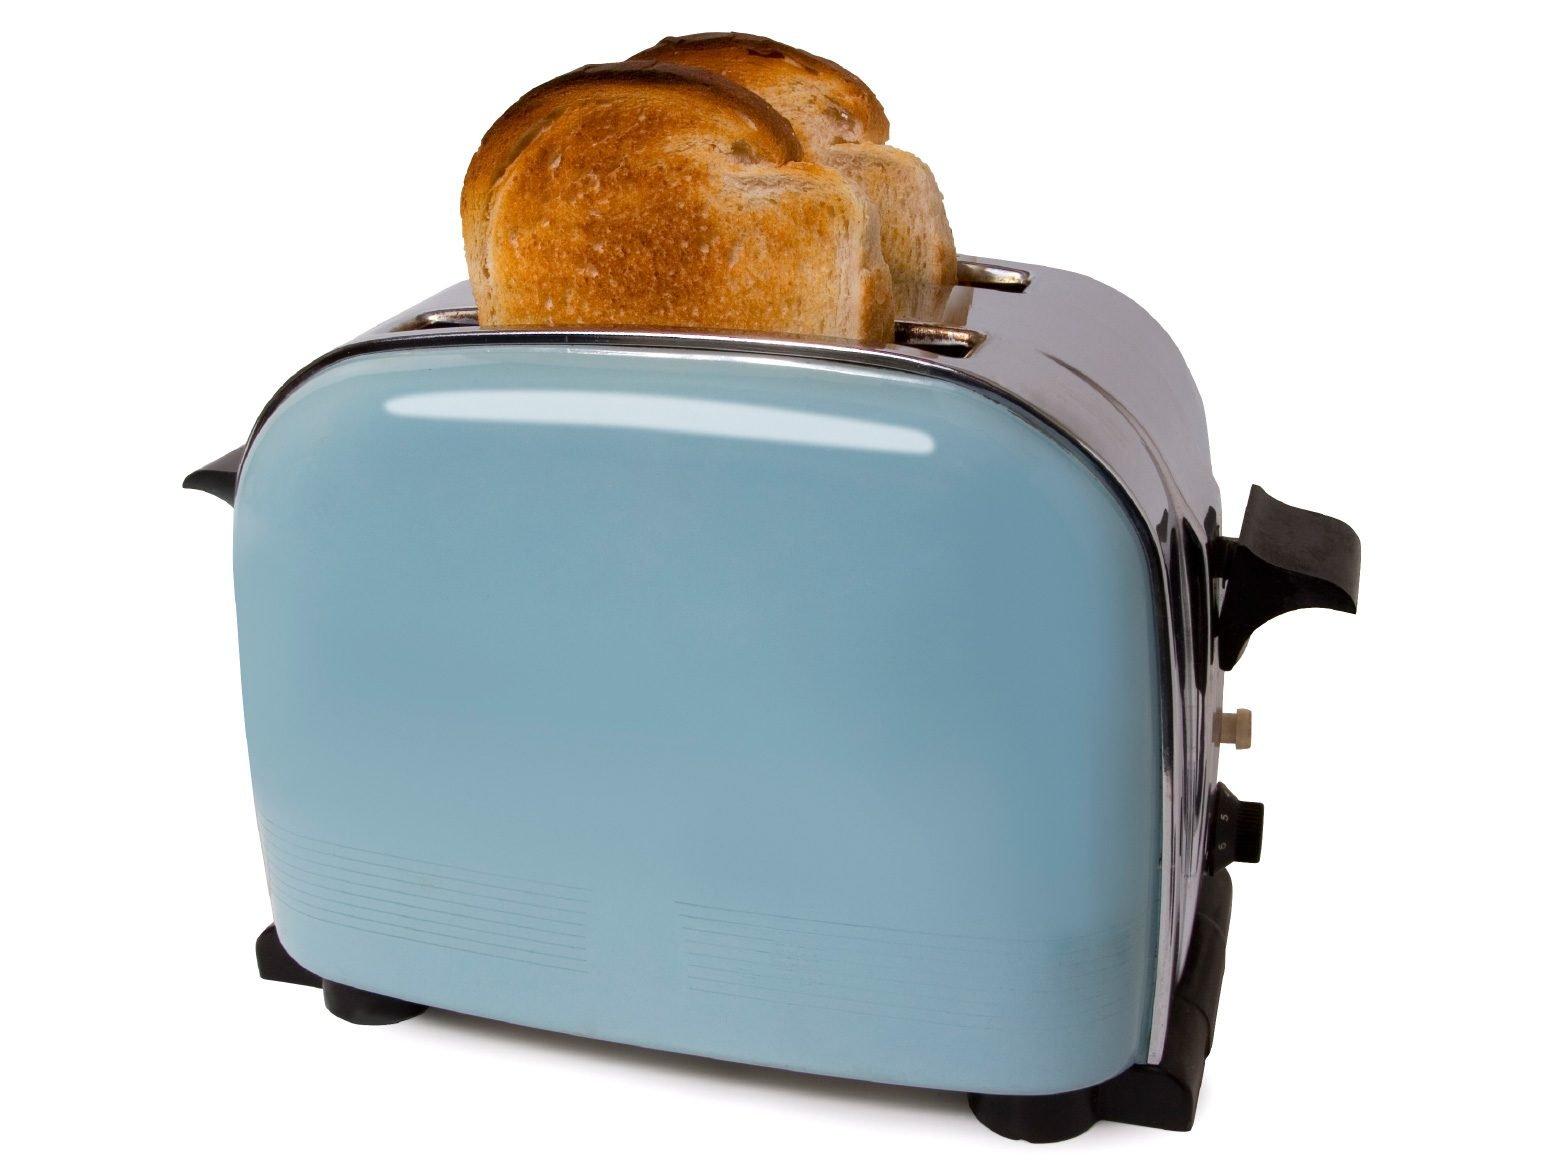 Kichen Smell Like Last Night's Dinner? Burn Toast